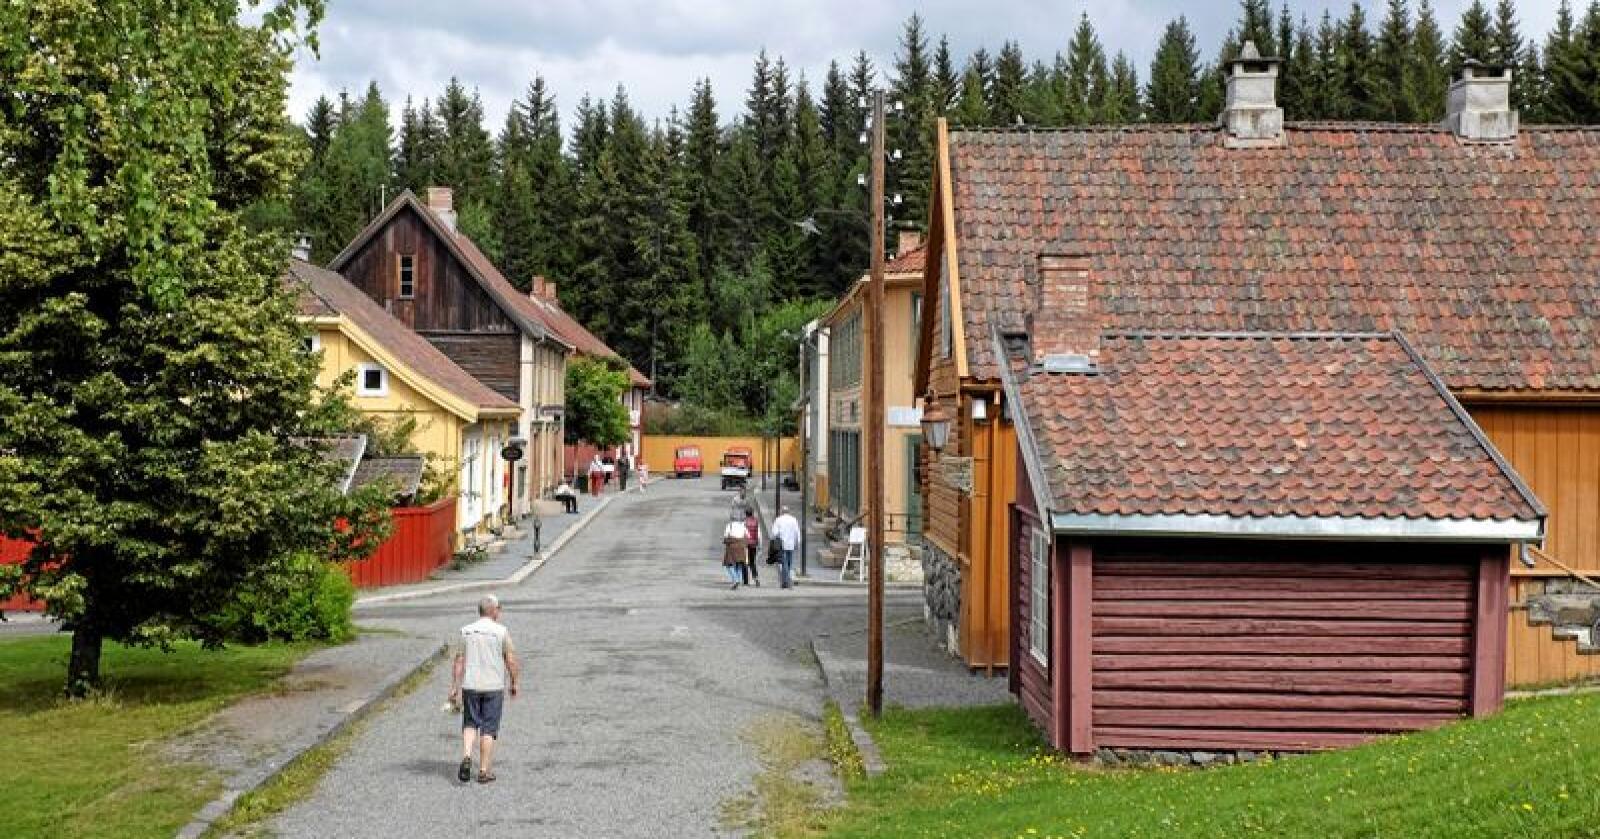 Stiftelsen Lillehammer museum har ansvaret for flere museer, blant annet Maihaugen. Bør museene slås sammen? Foto: Marianne Løvland / NTB scanpix